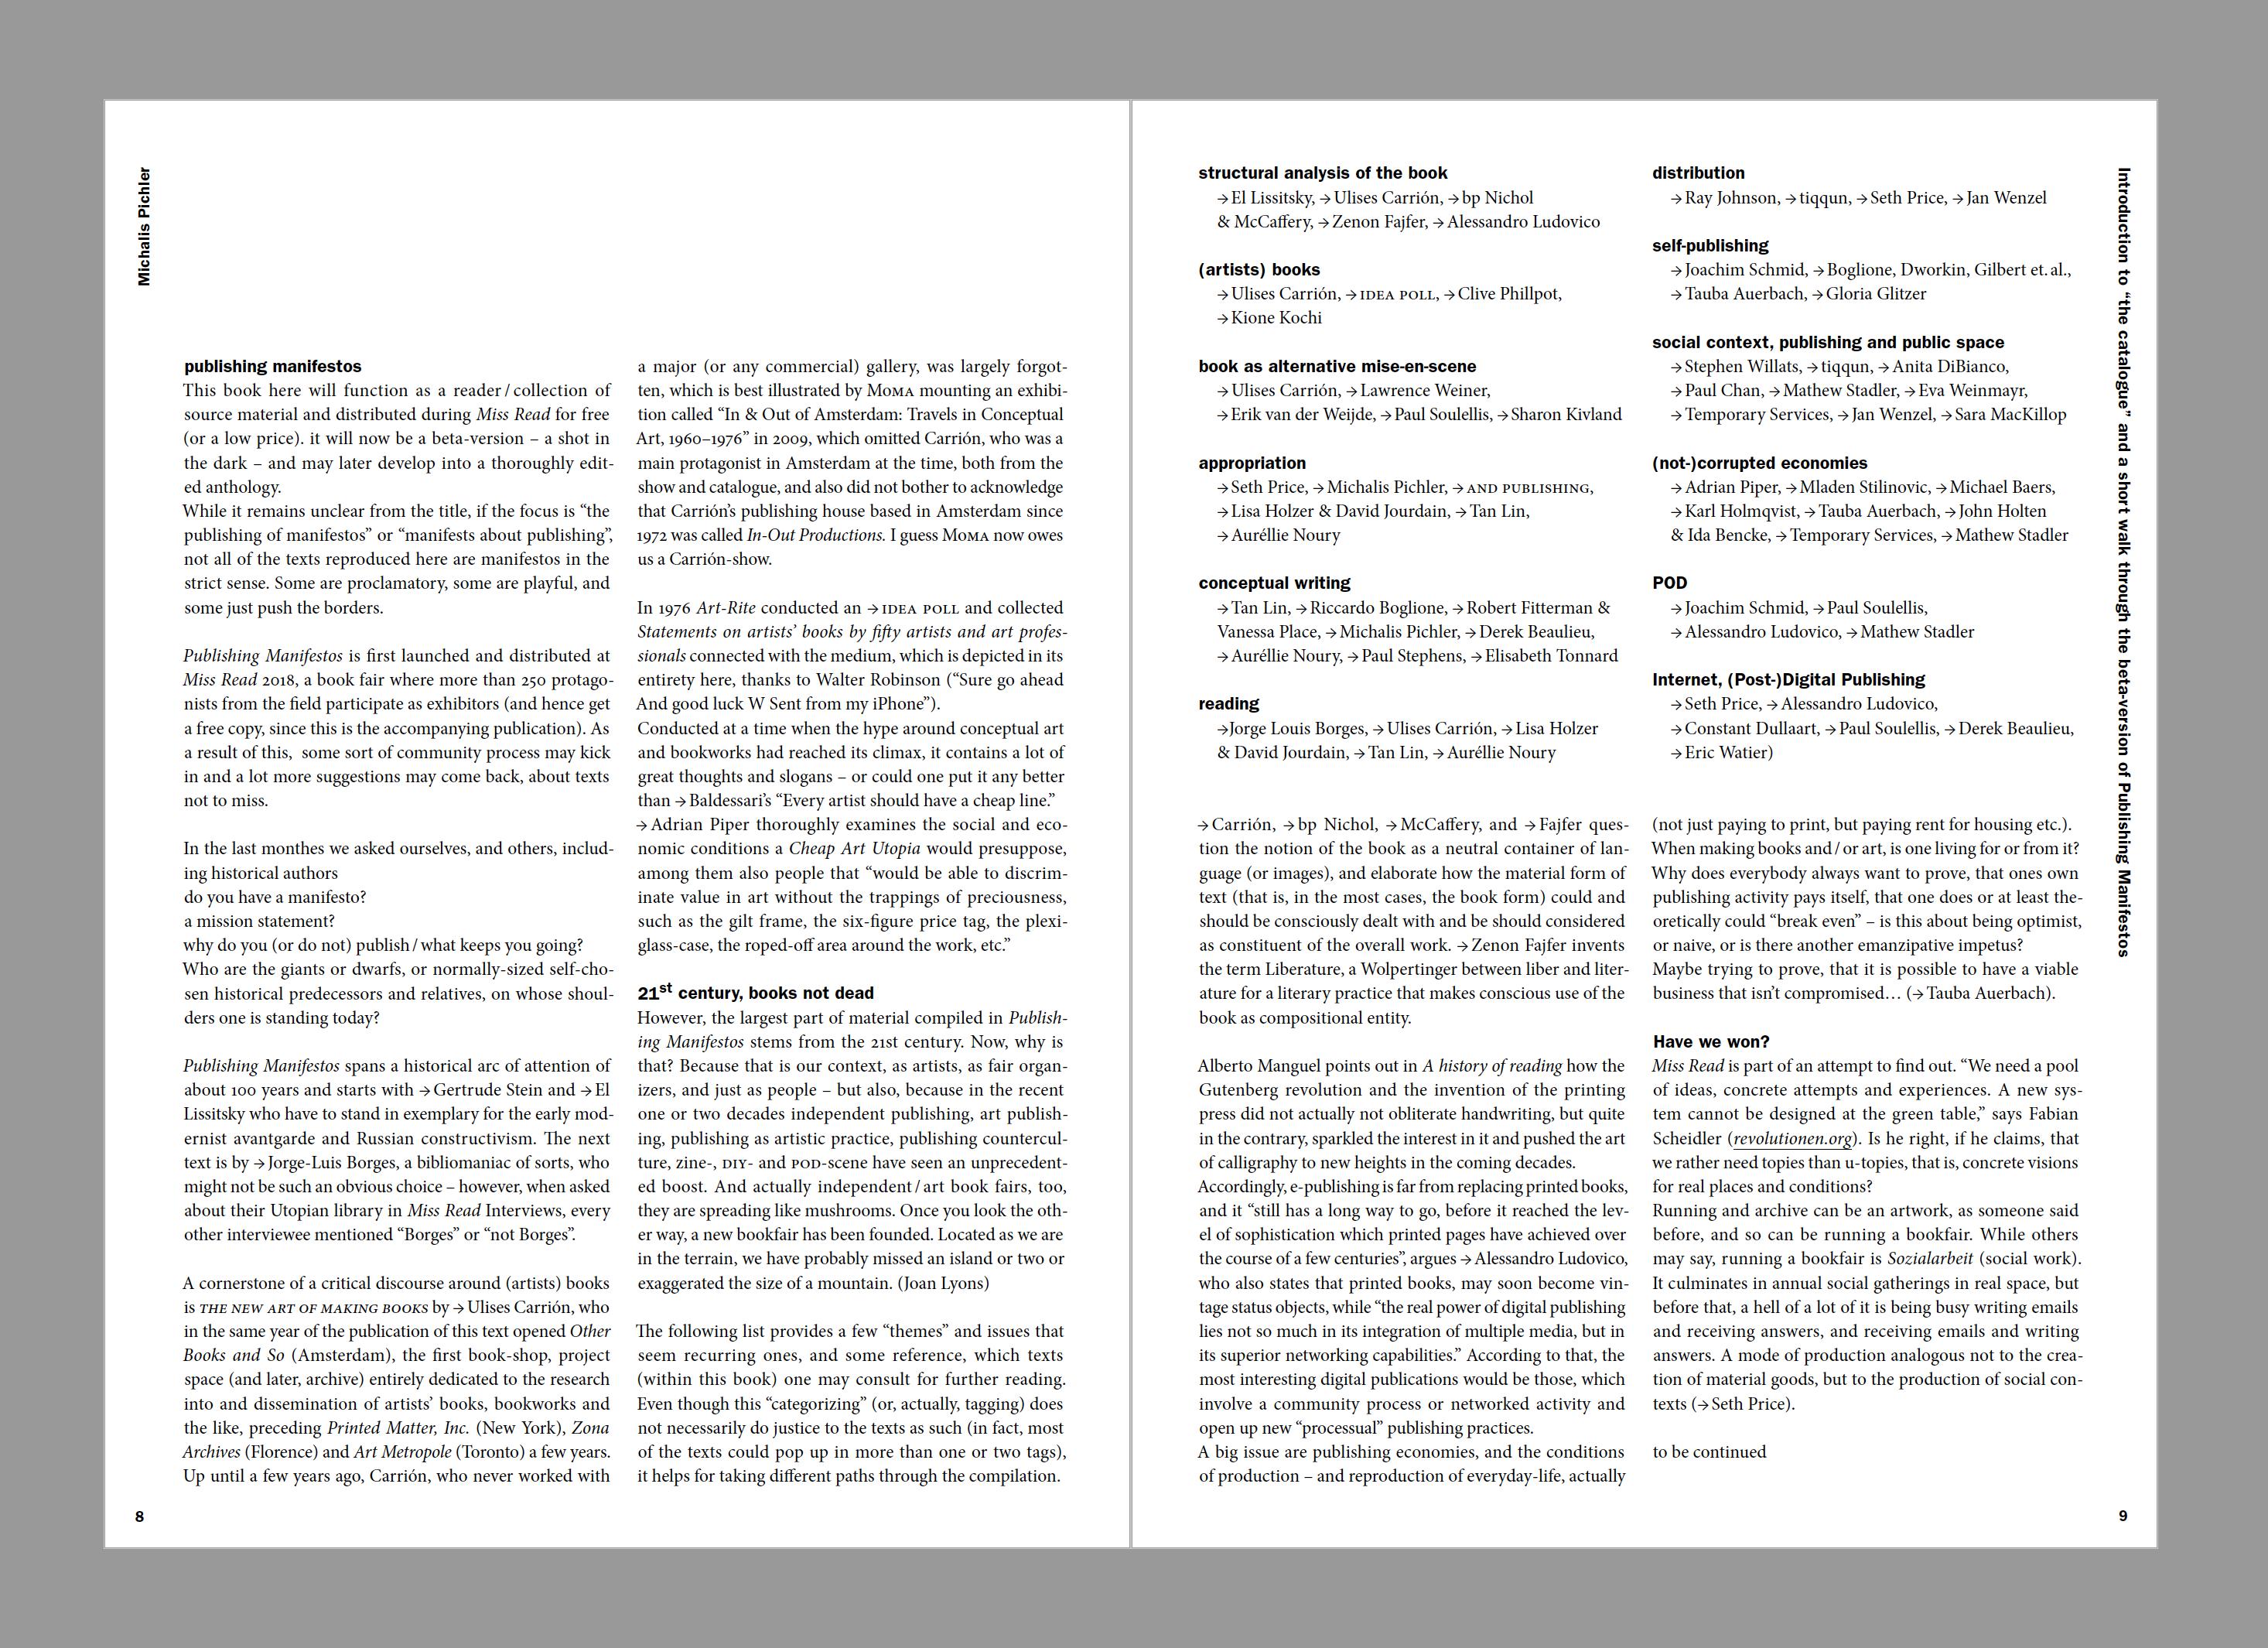 edcat – Publishing Manifestos (Beta Version)